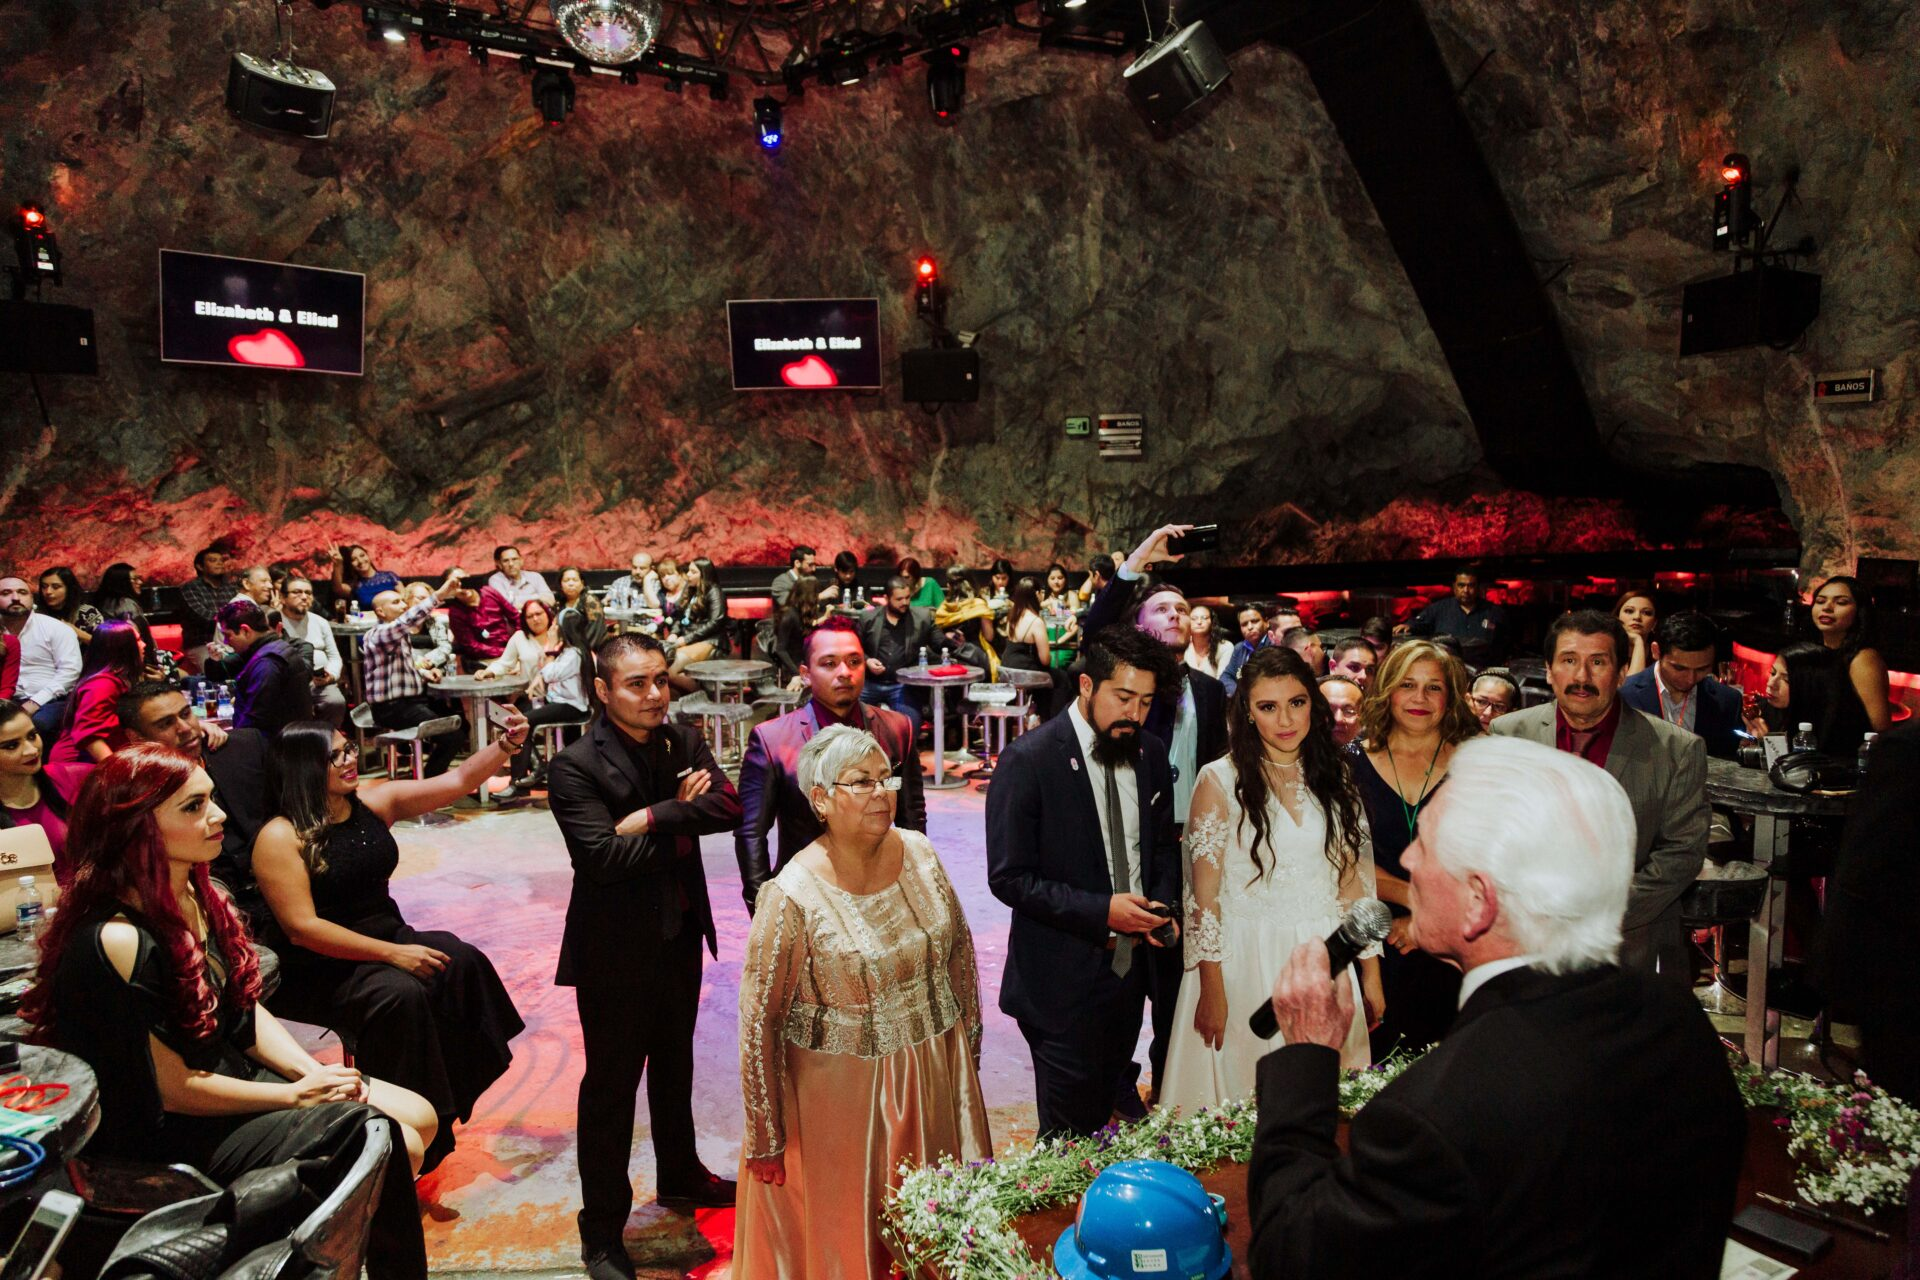 javier_noriega_fotografo_bodas_la_mina_club_zacatecas_wedding_photographer10